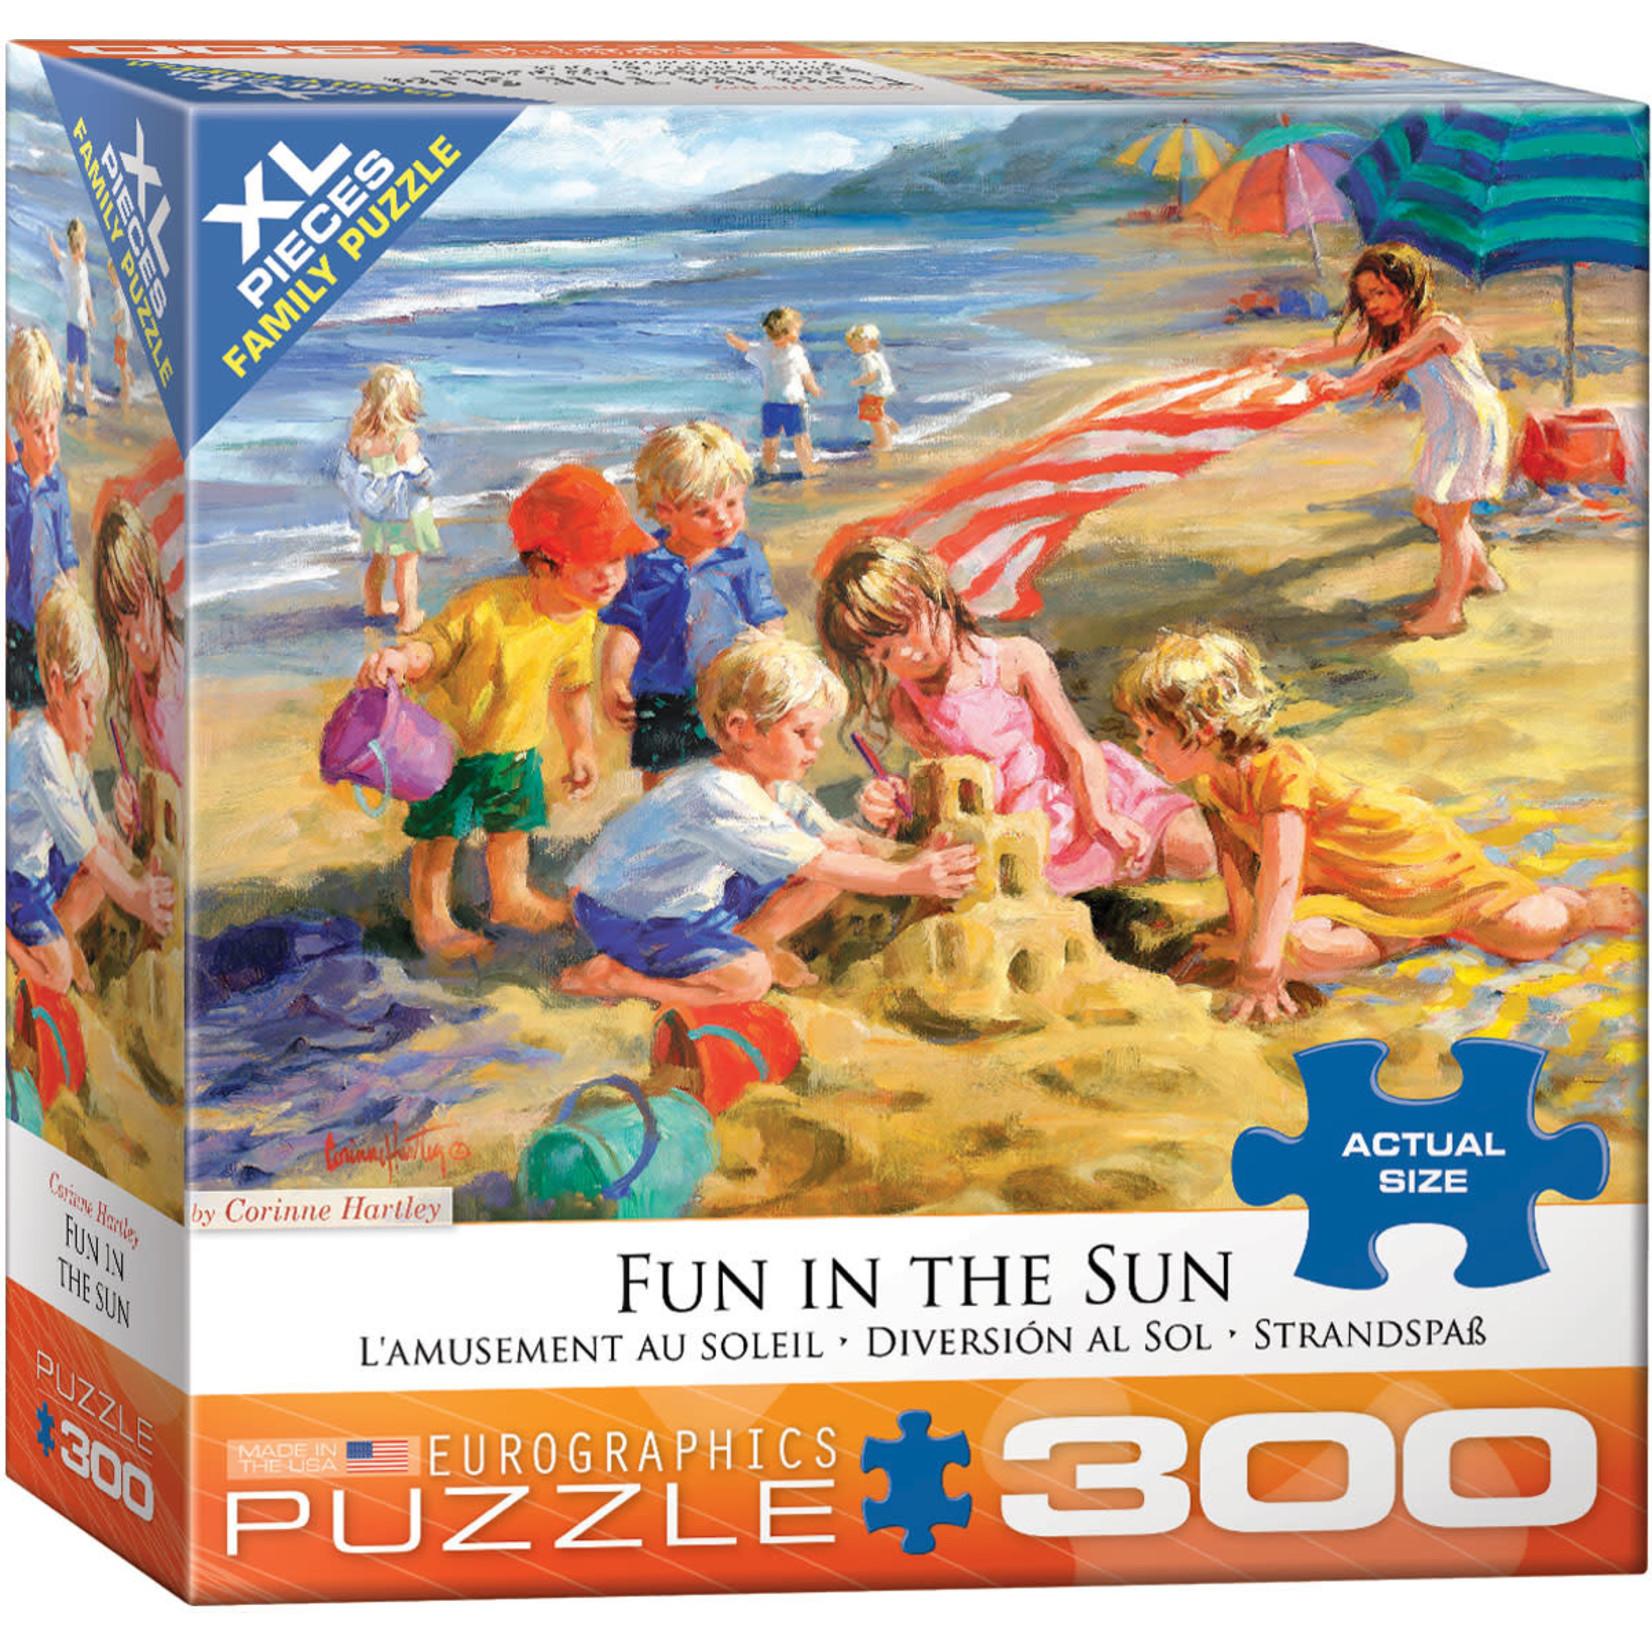 Eurographics Eurographics Puzzle: Fun in the Sun - 300pc